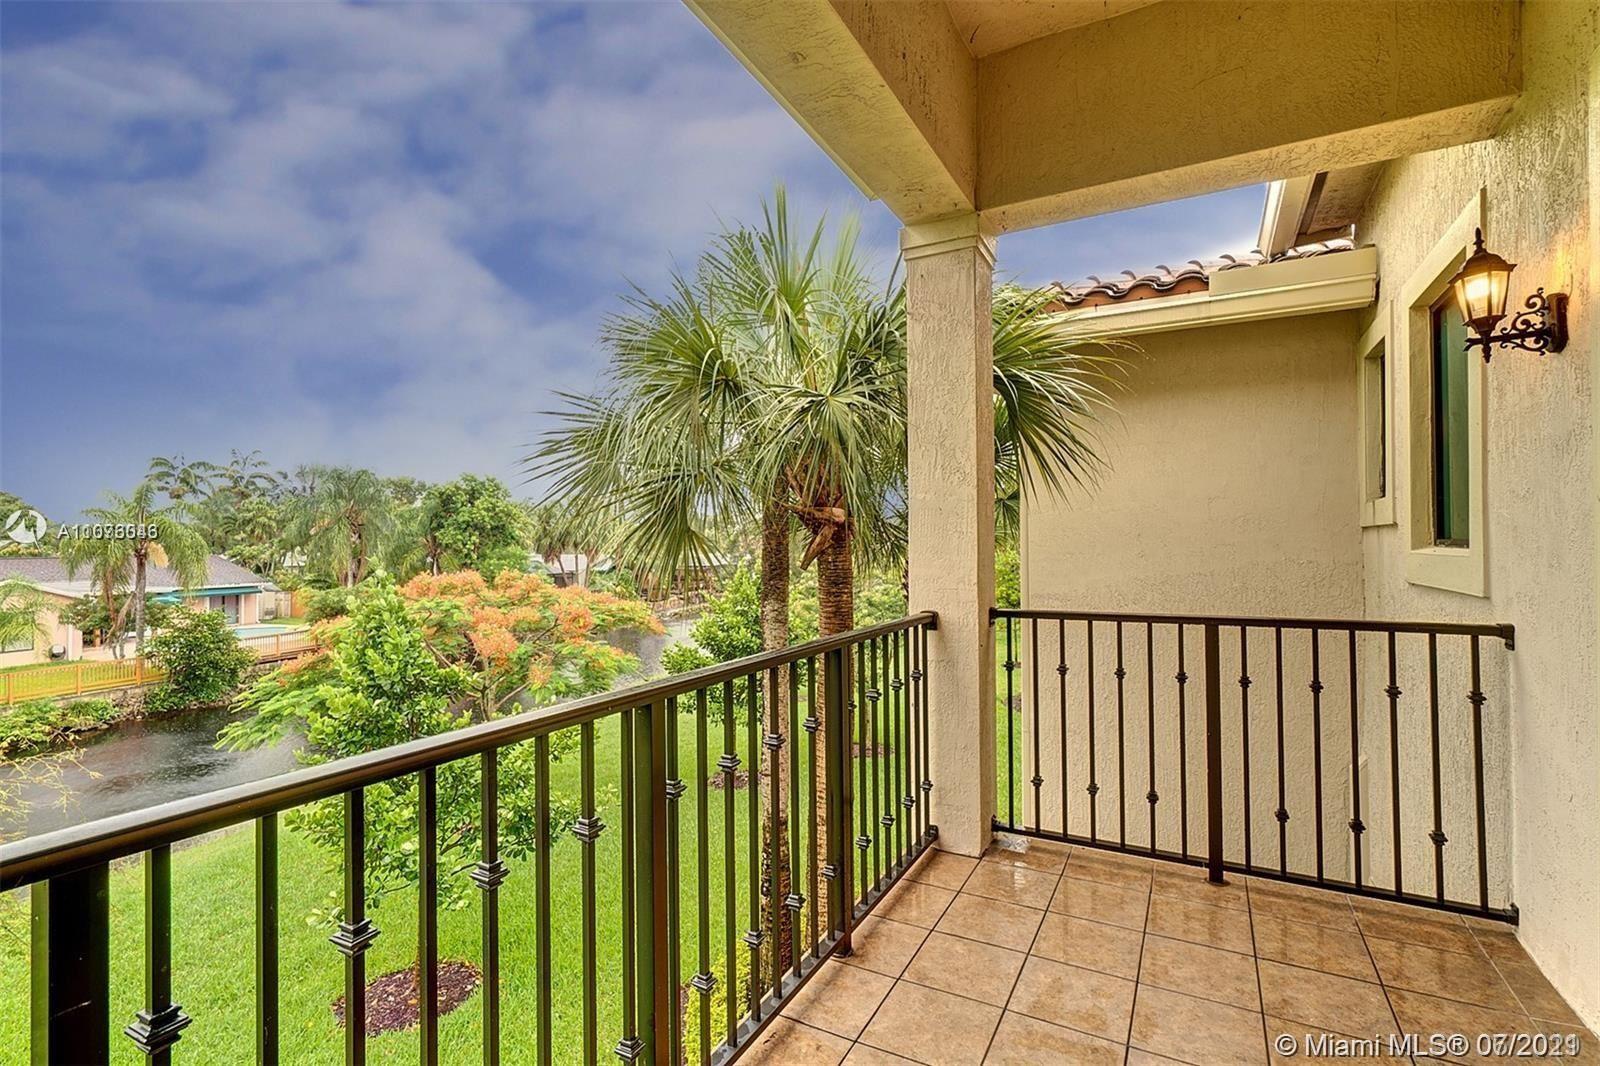 Photo of 136 SW 127th Terrace, Plantation, FL 33325 (MLS # A11076043)